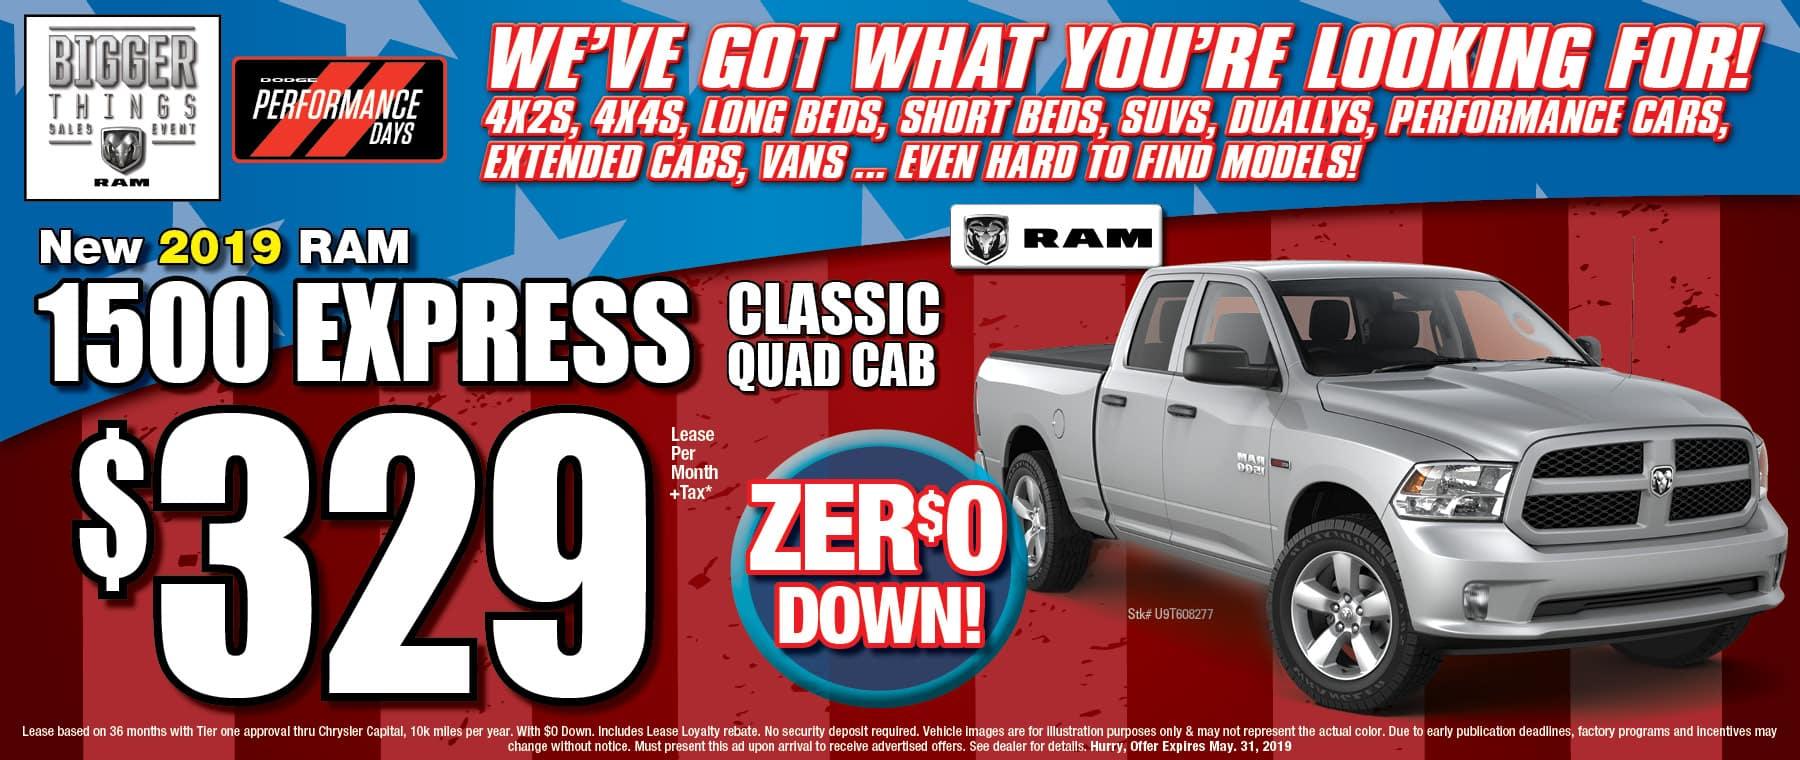 New 2019 Ram 1500 Quad Cab Express Classic!